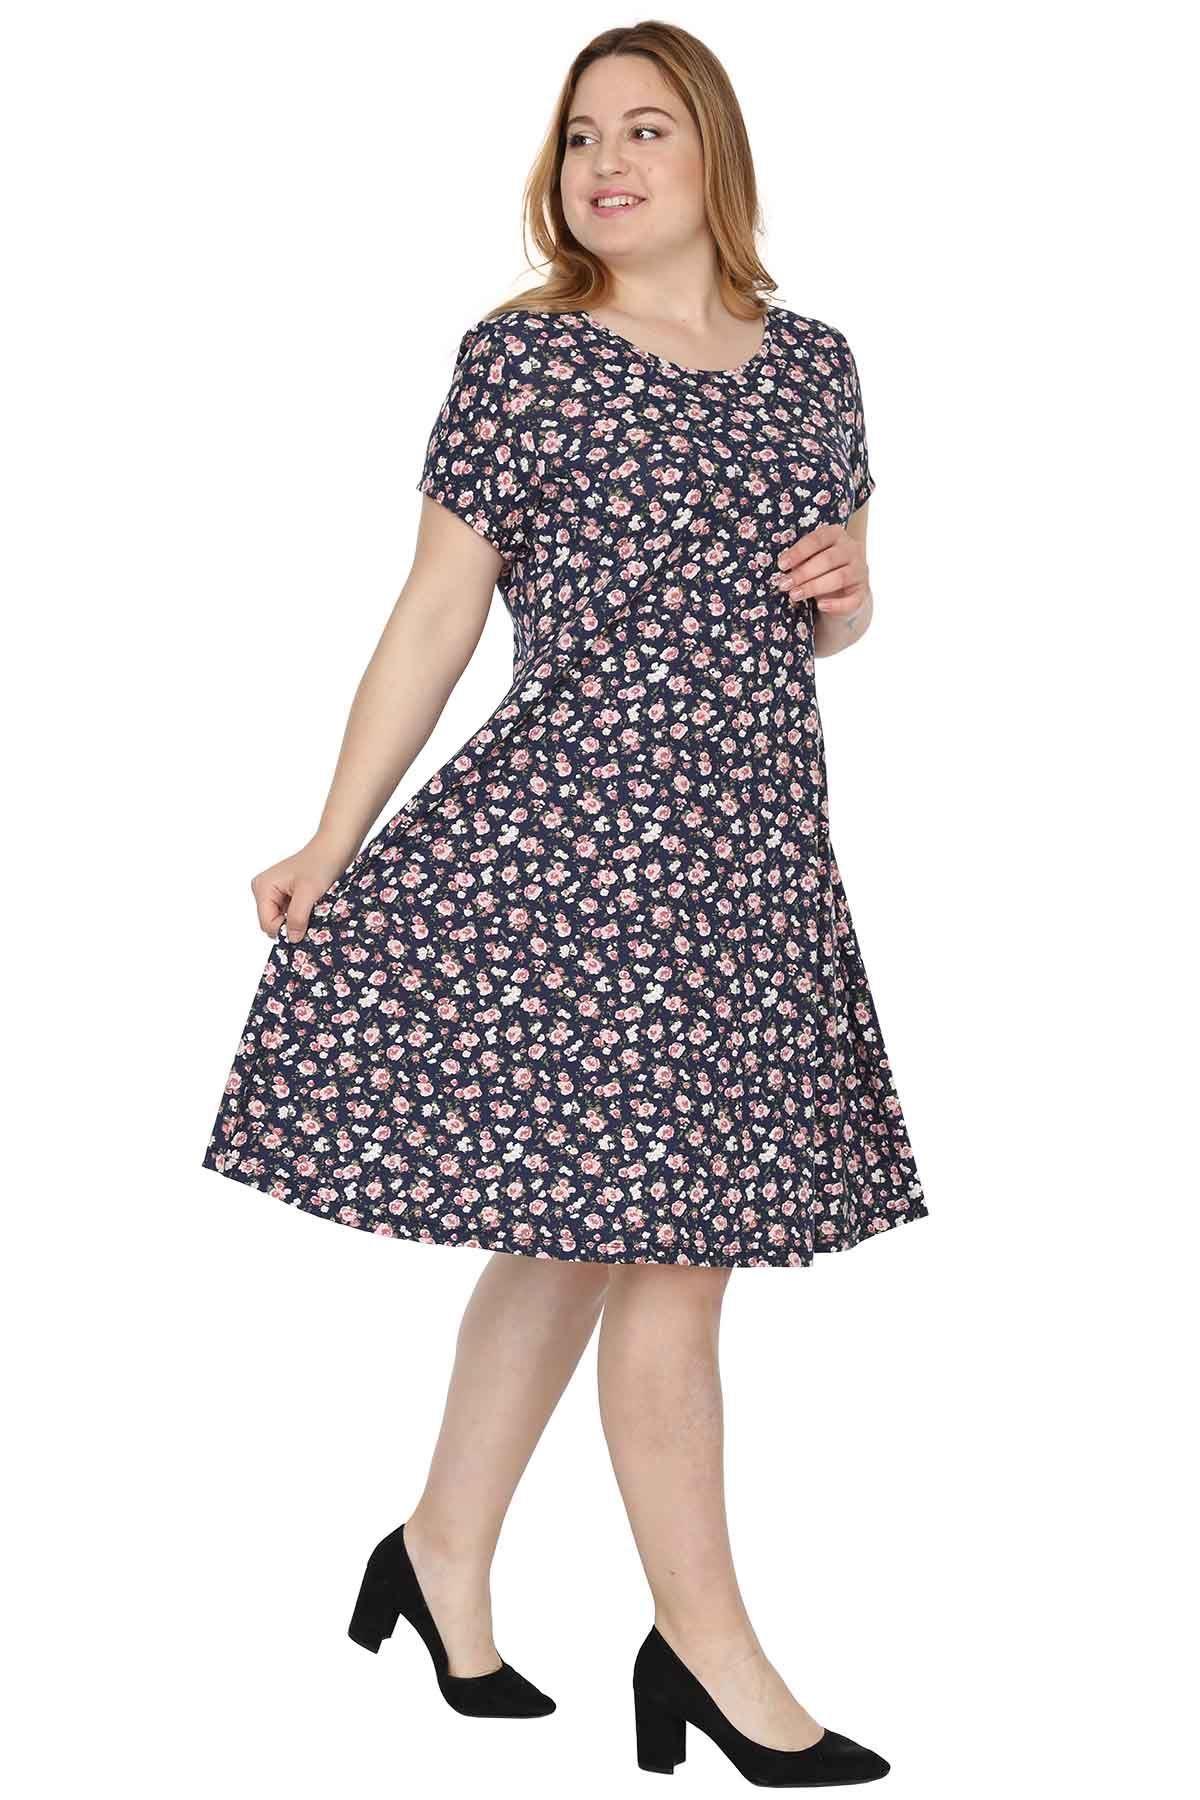 Kısa Kol Kloş Elbise 1D-0532